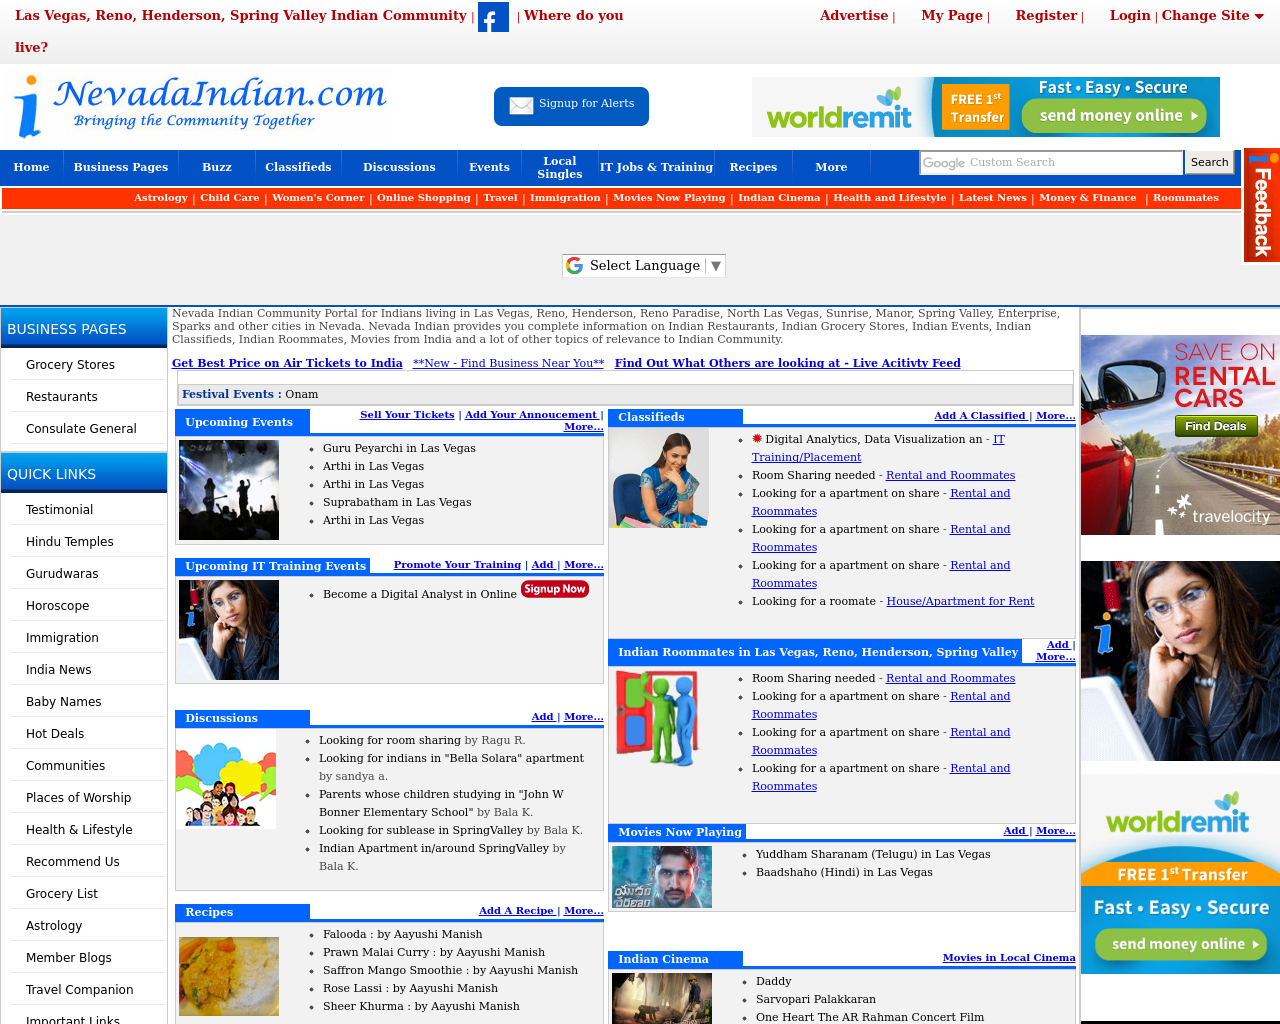 NevadaIndian-Advertising-Reviews-Pricing